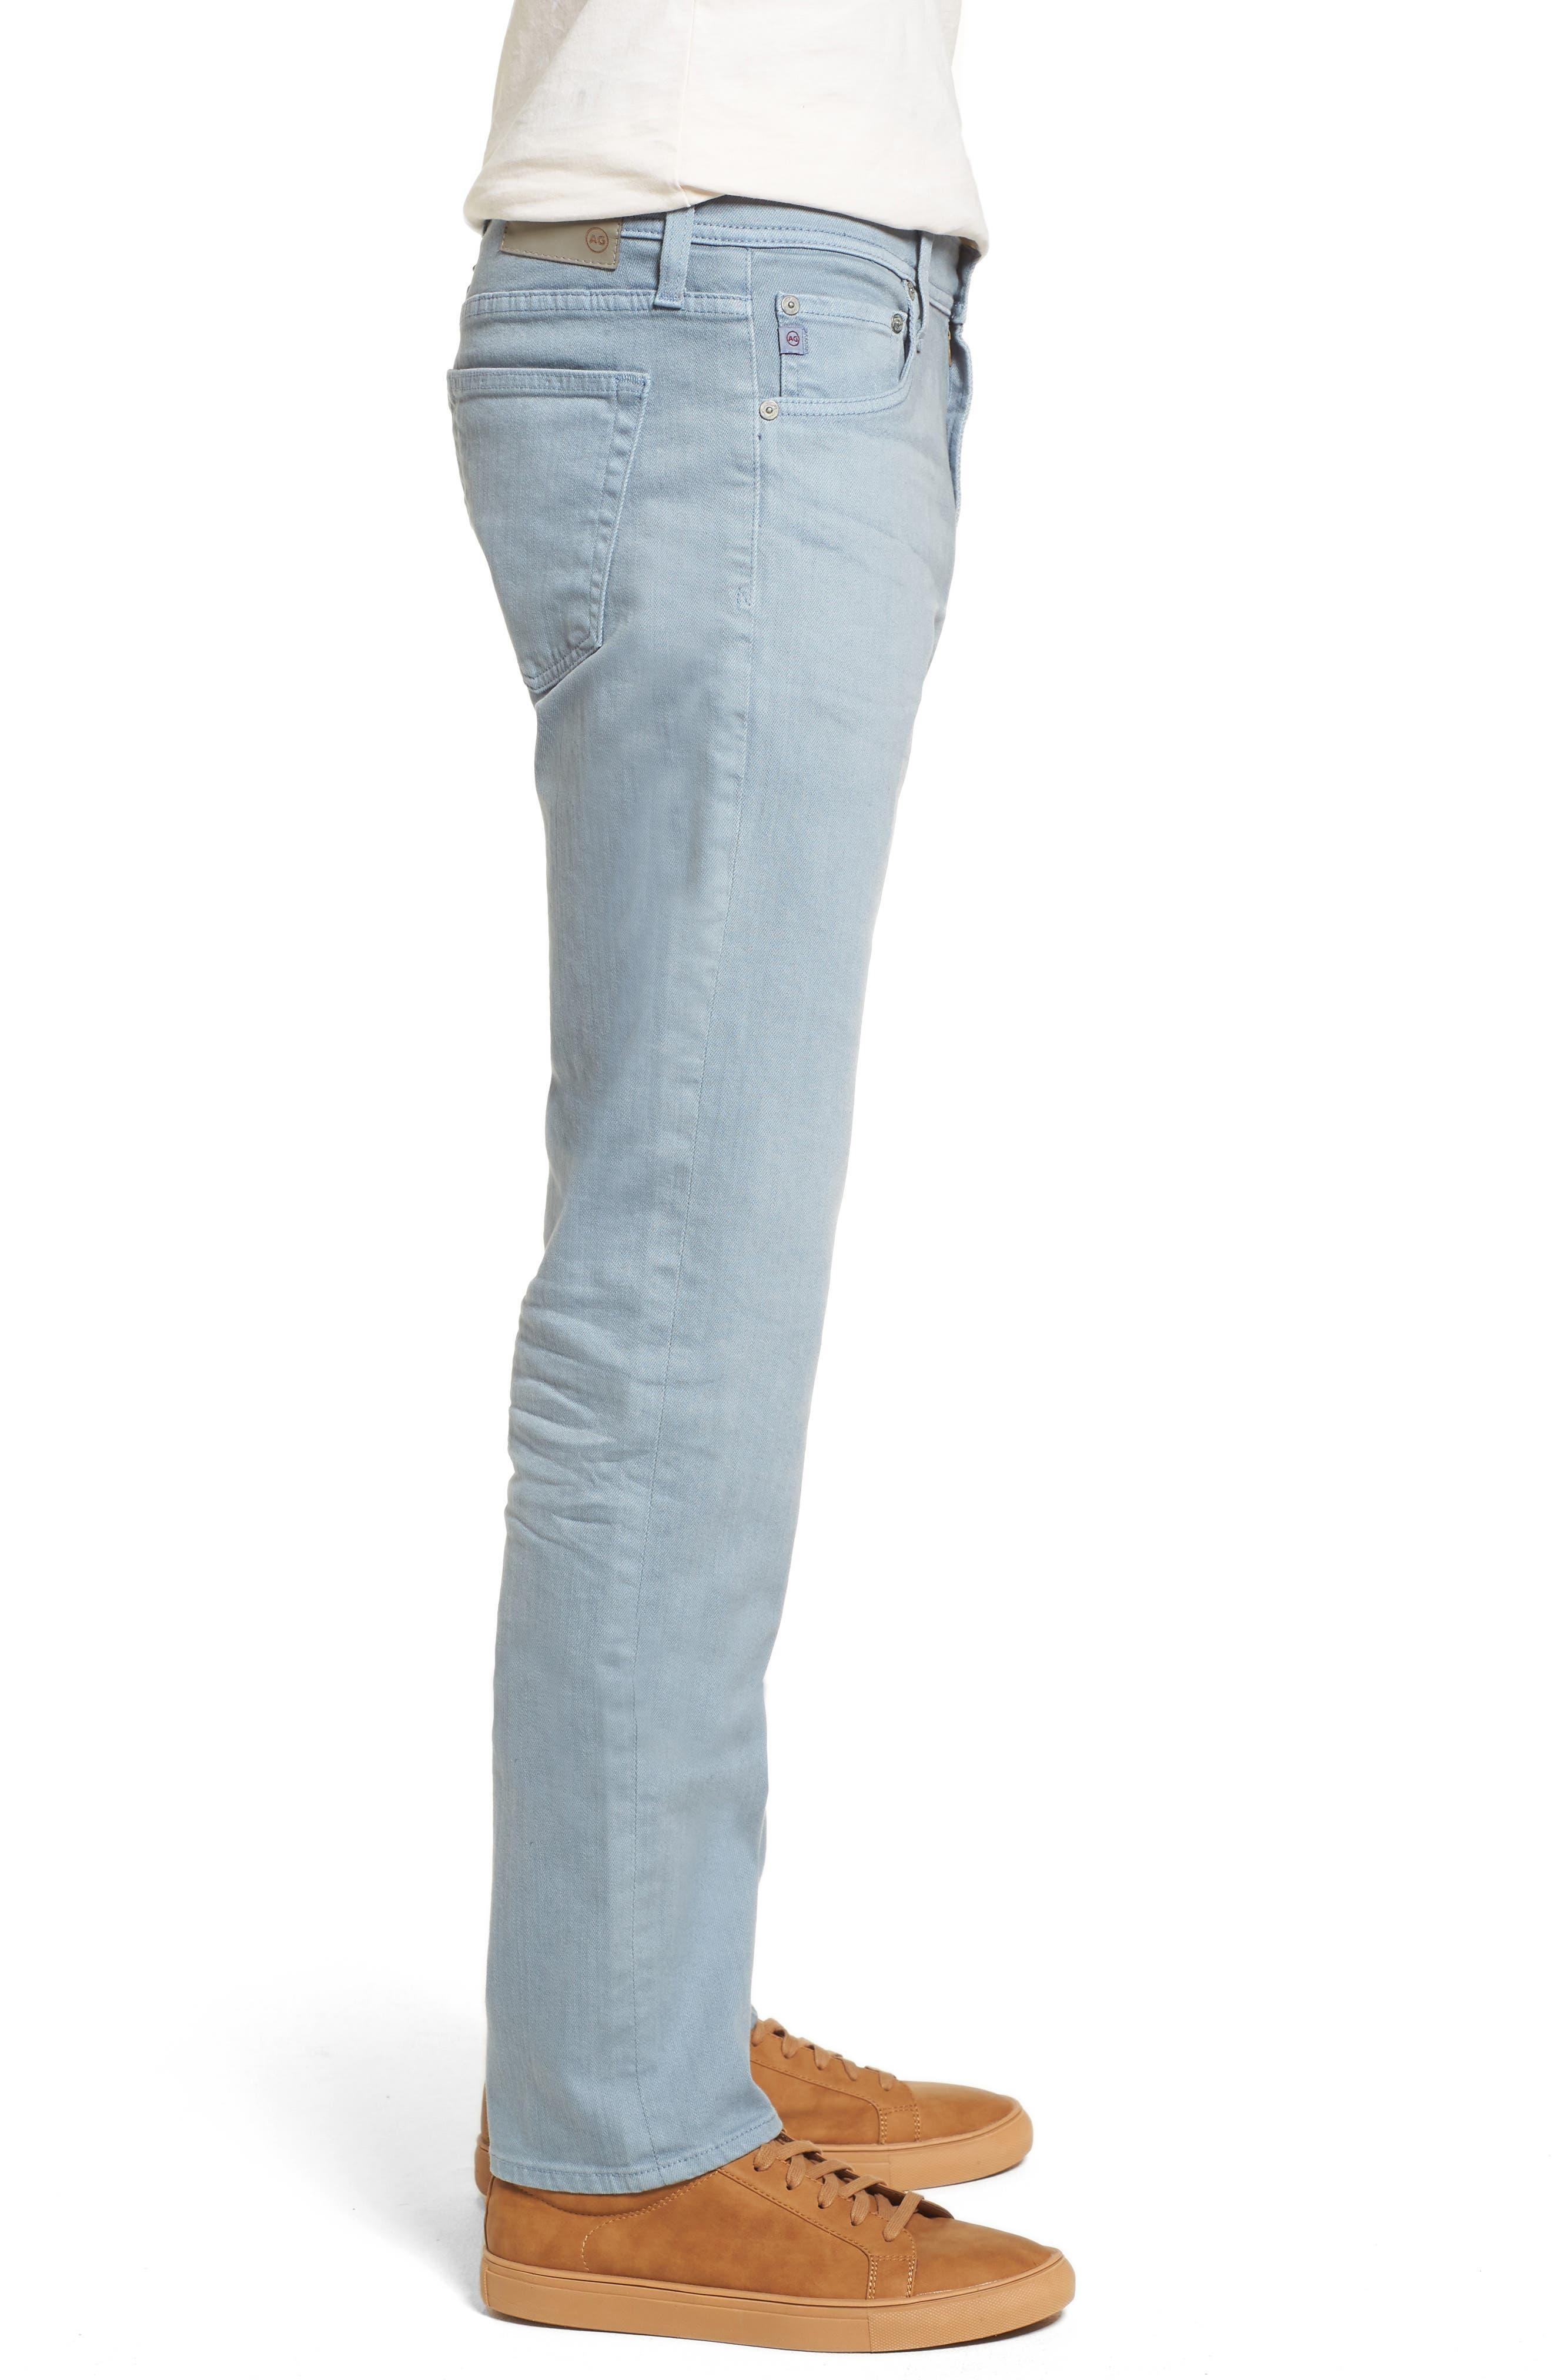 Tellis Slim Fit Jeans,                             Alternate thumbnail 3, color,                             480